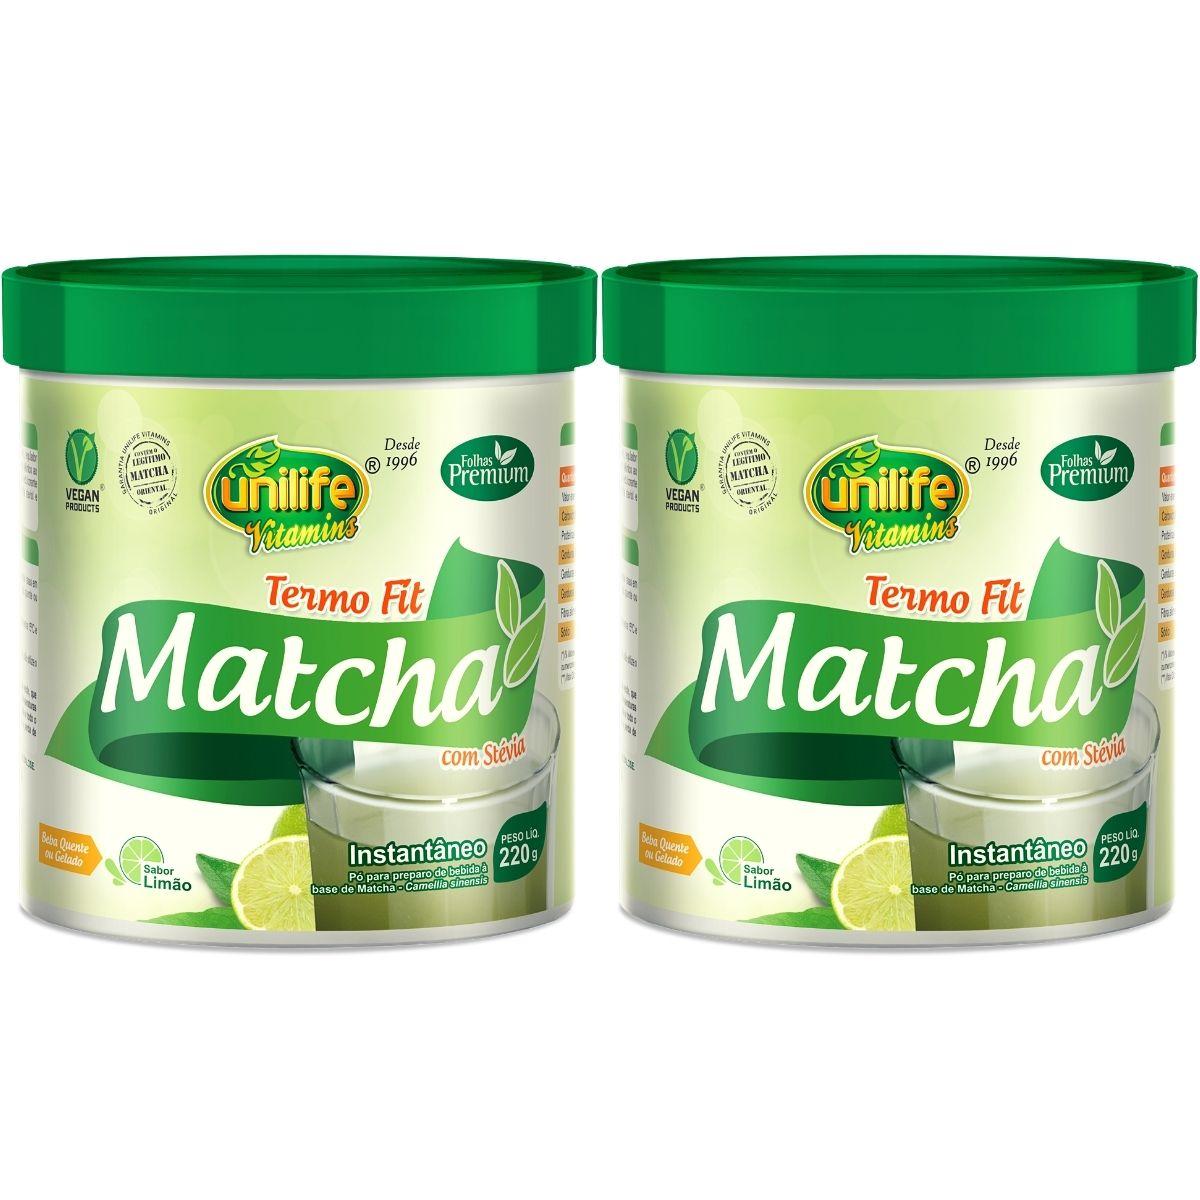 Kit 2 Matcha Instantâneo C/ Stévia Termo Fit Unilife - 220g Sabor: Limão